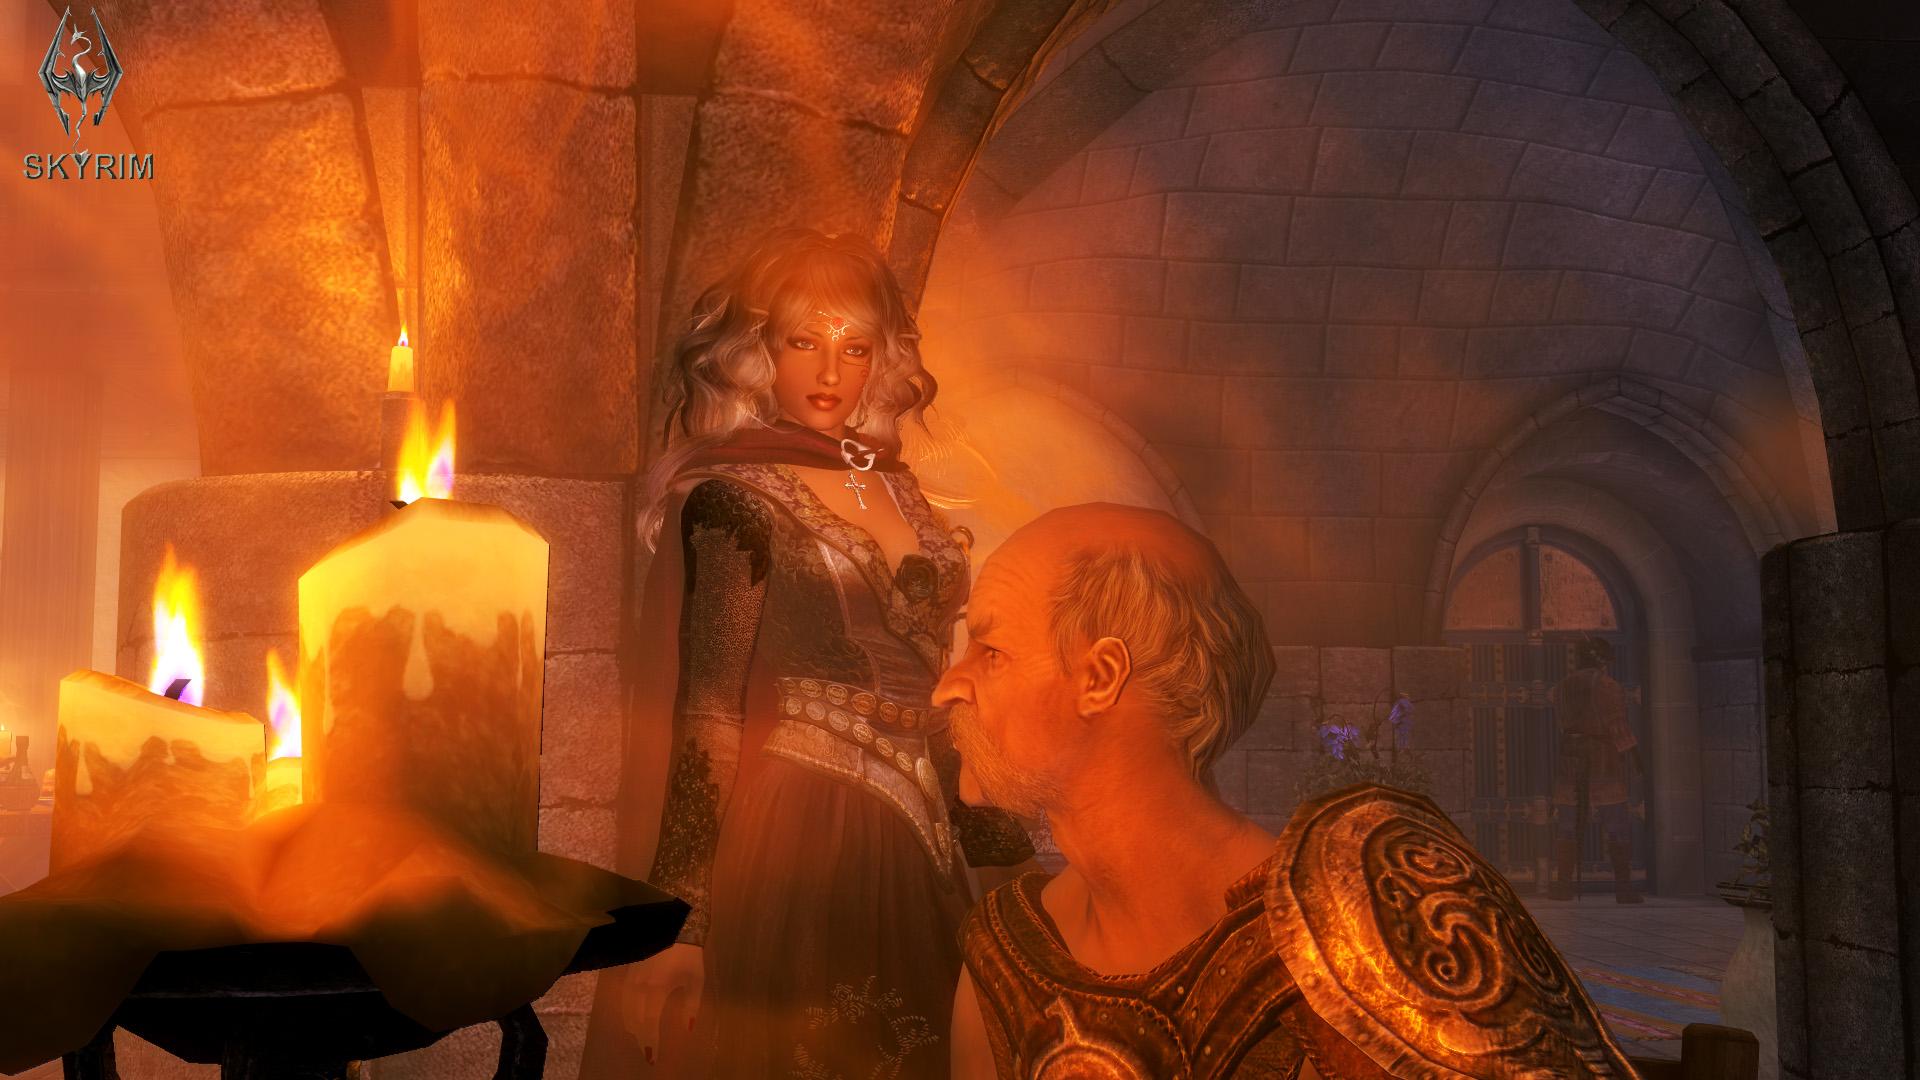 079. В таверне.jpg - Elder Scrolls 5: Skyrim, the CBBE, Сборка-21